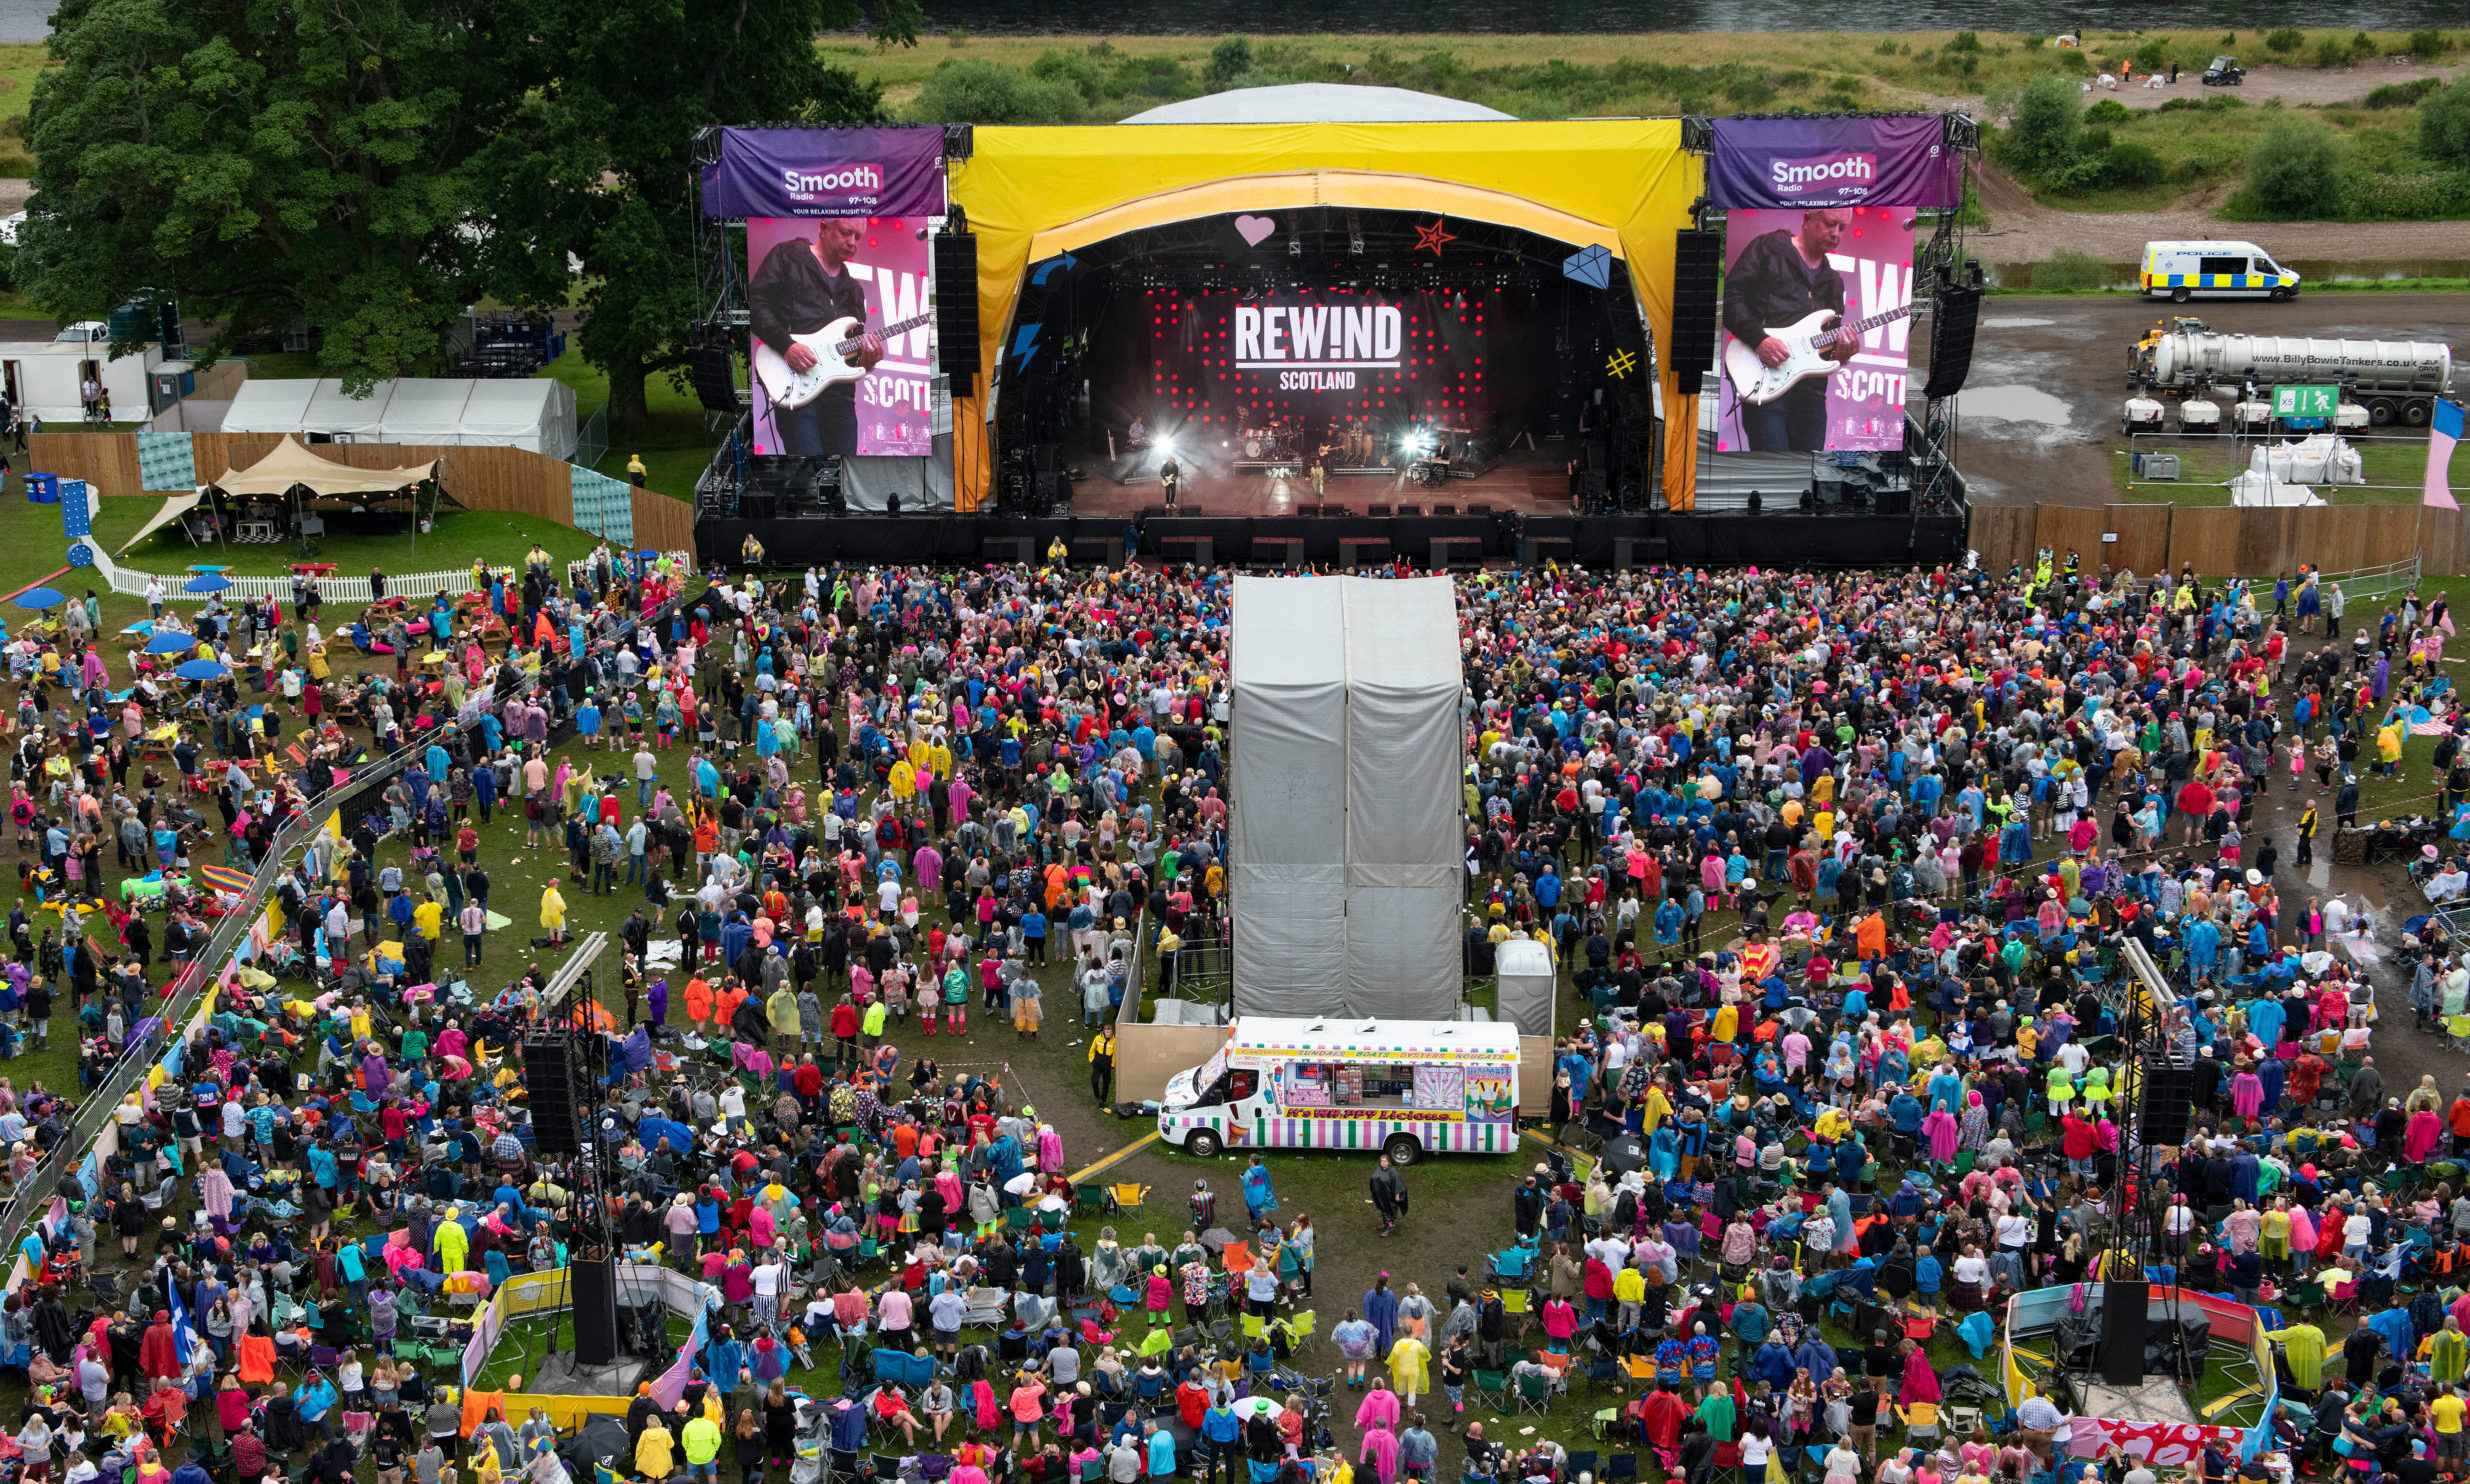 Rewind Festival, Perth, 2019. Photo: Duncan Bryceland/Shutterstock